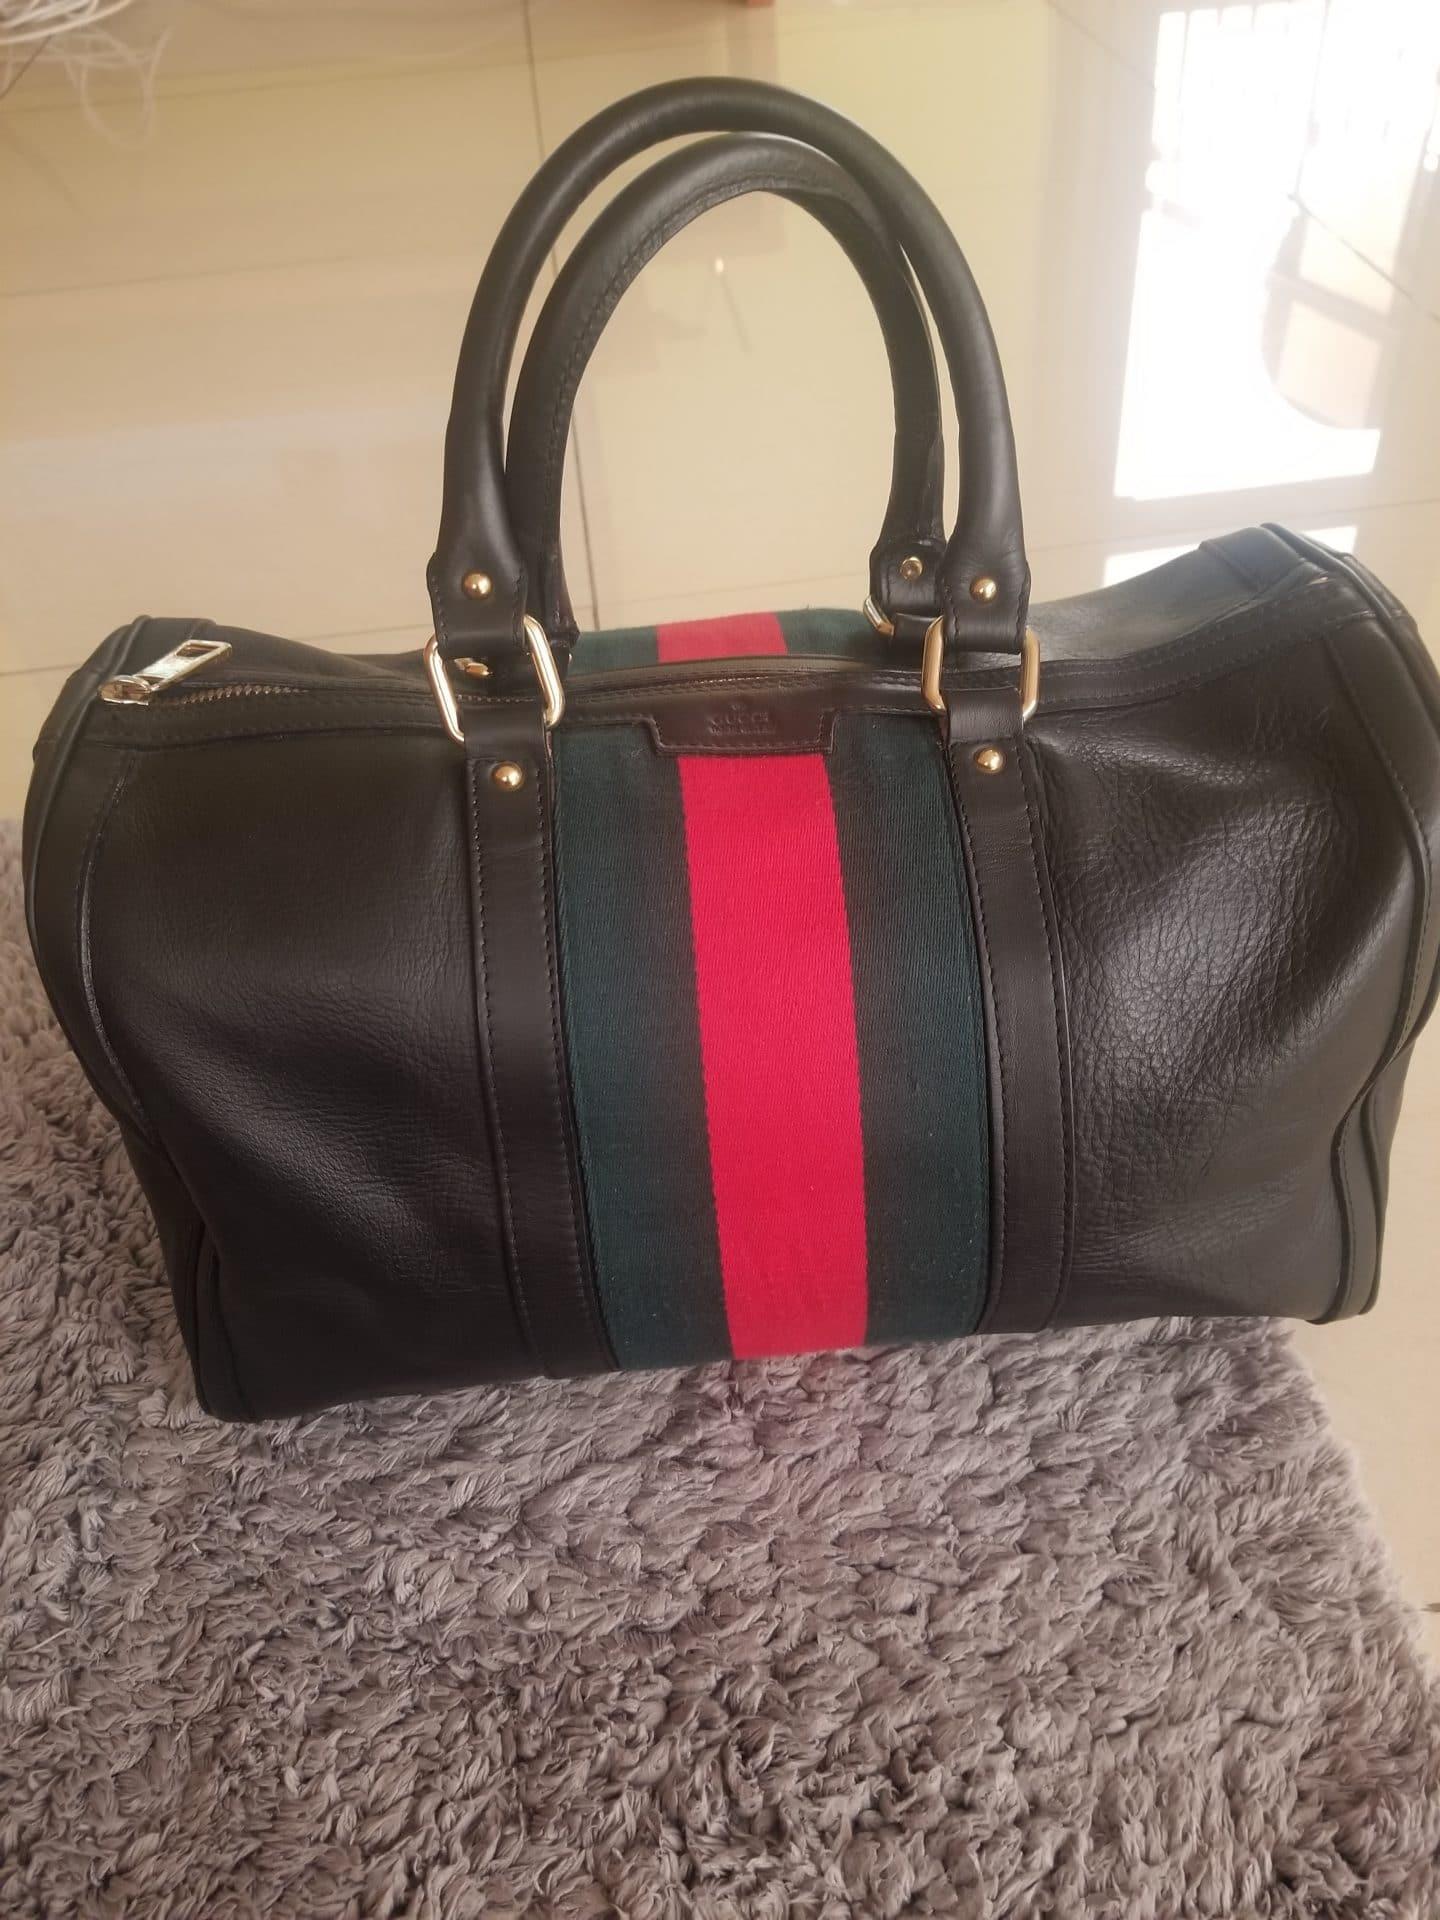 Sac Gucci Boston cuir grainé marron bande web authentique occasion